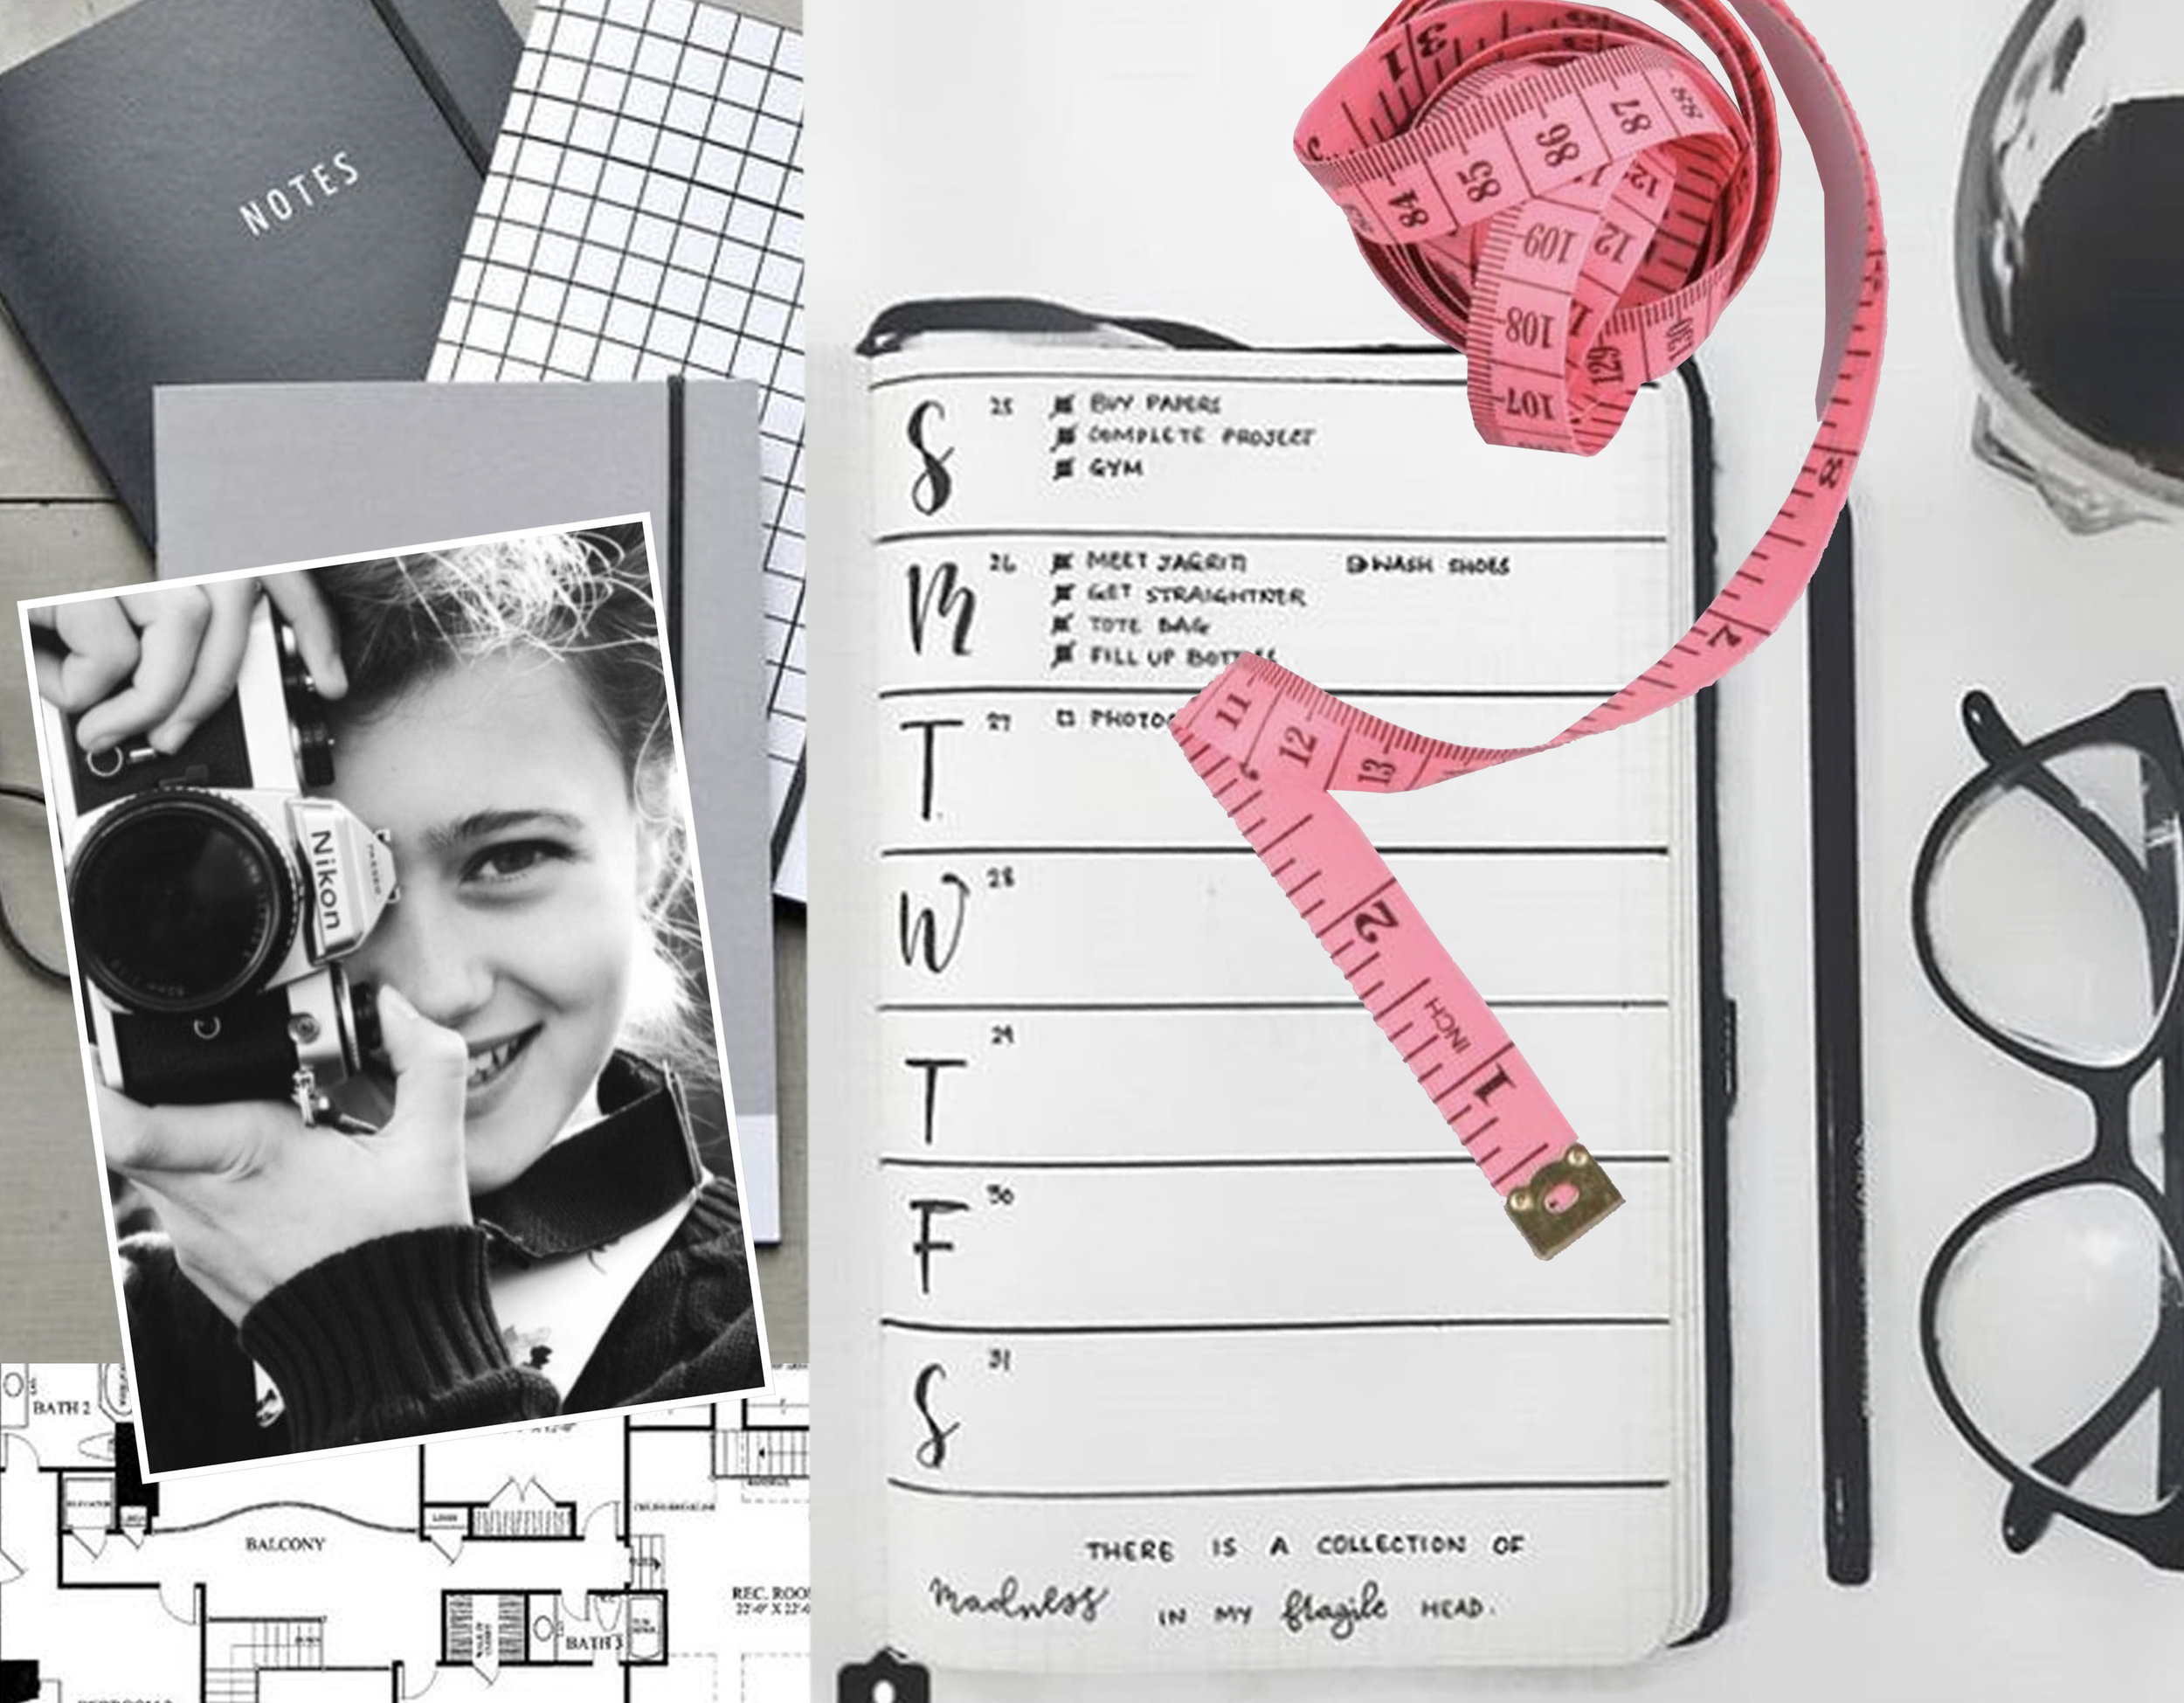 notebooks  Pasinga  - girl with camera via  Tumblr  - journal via  Jihi Elephant